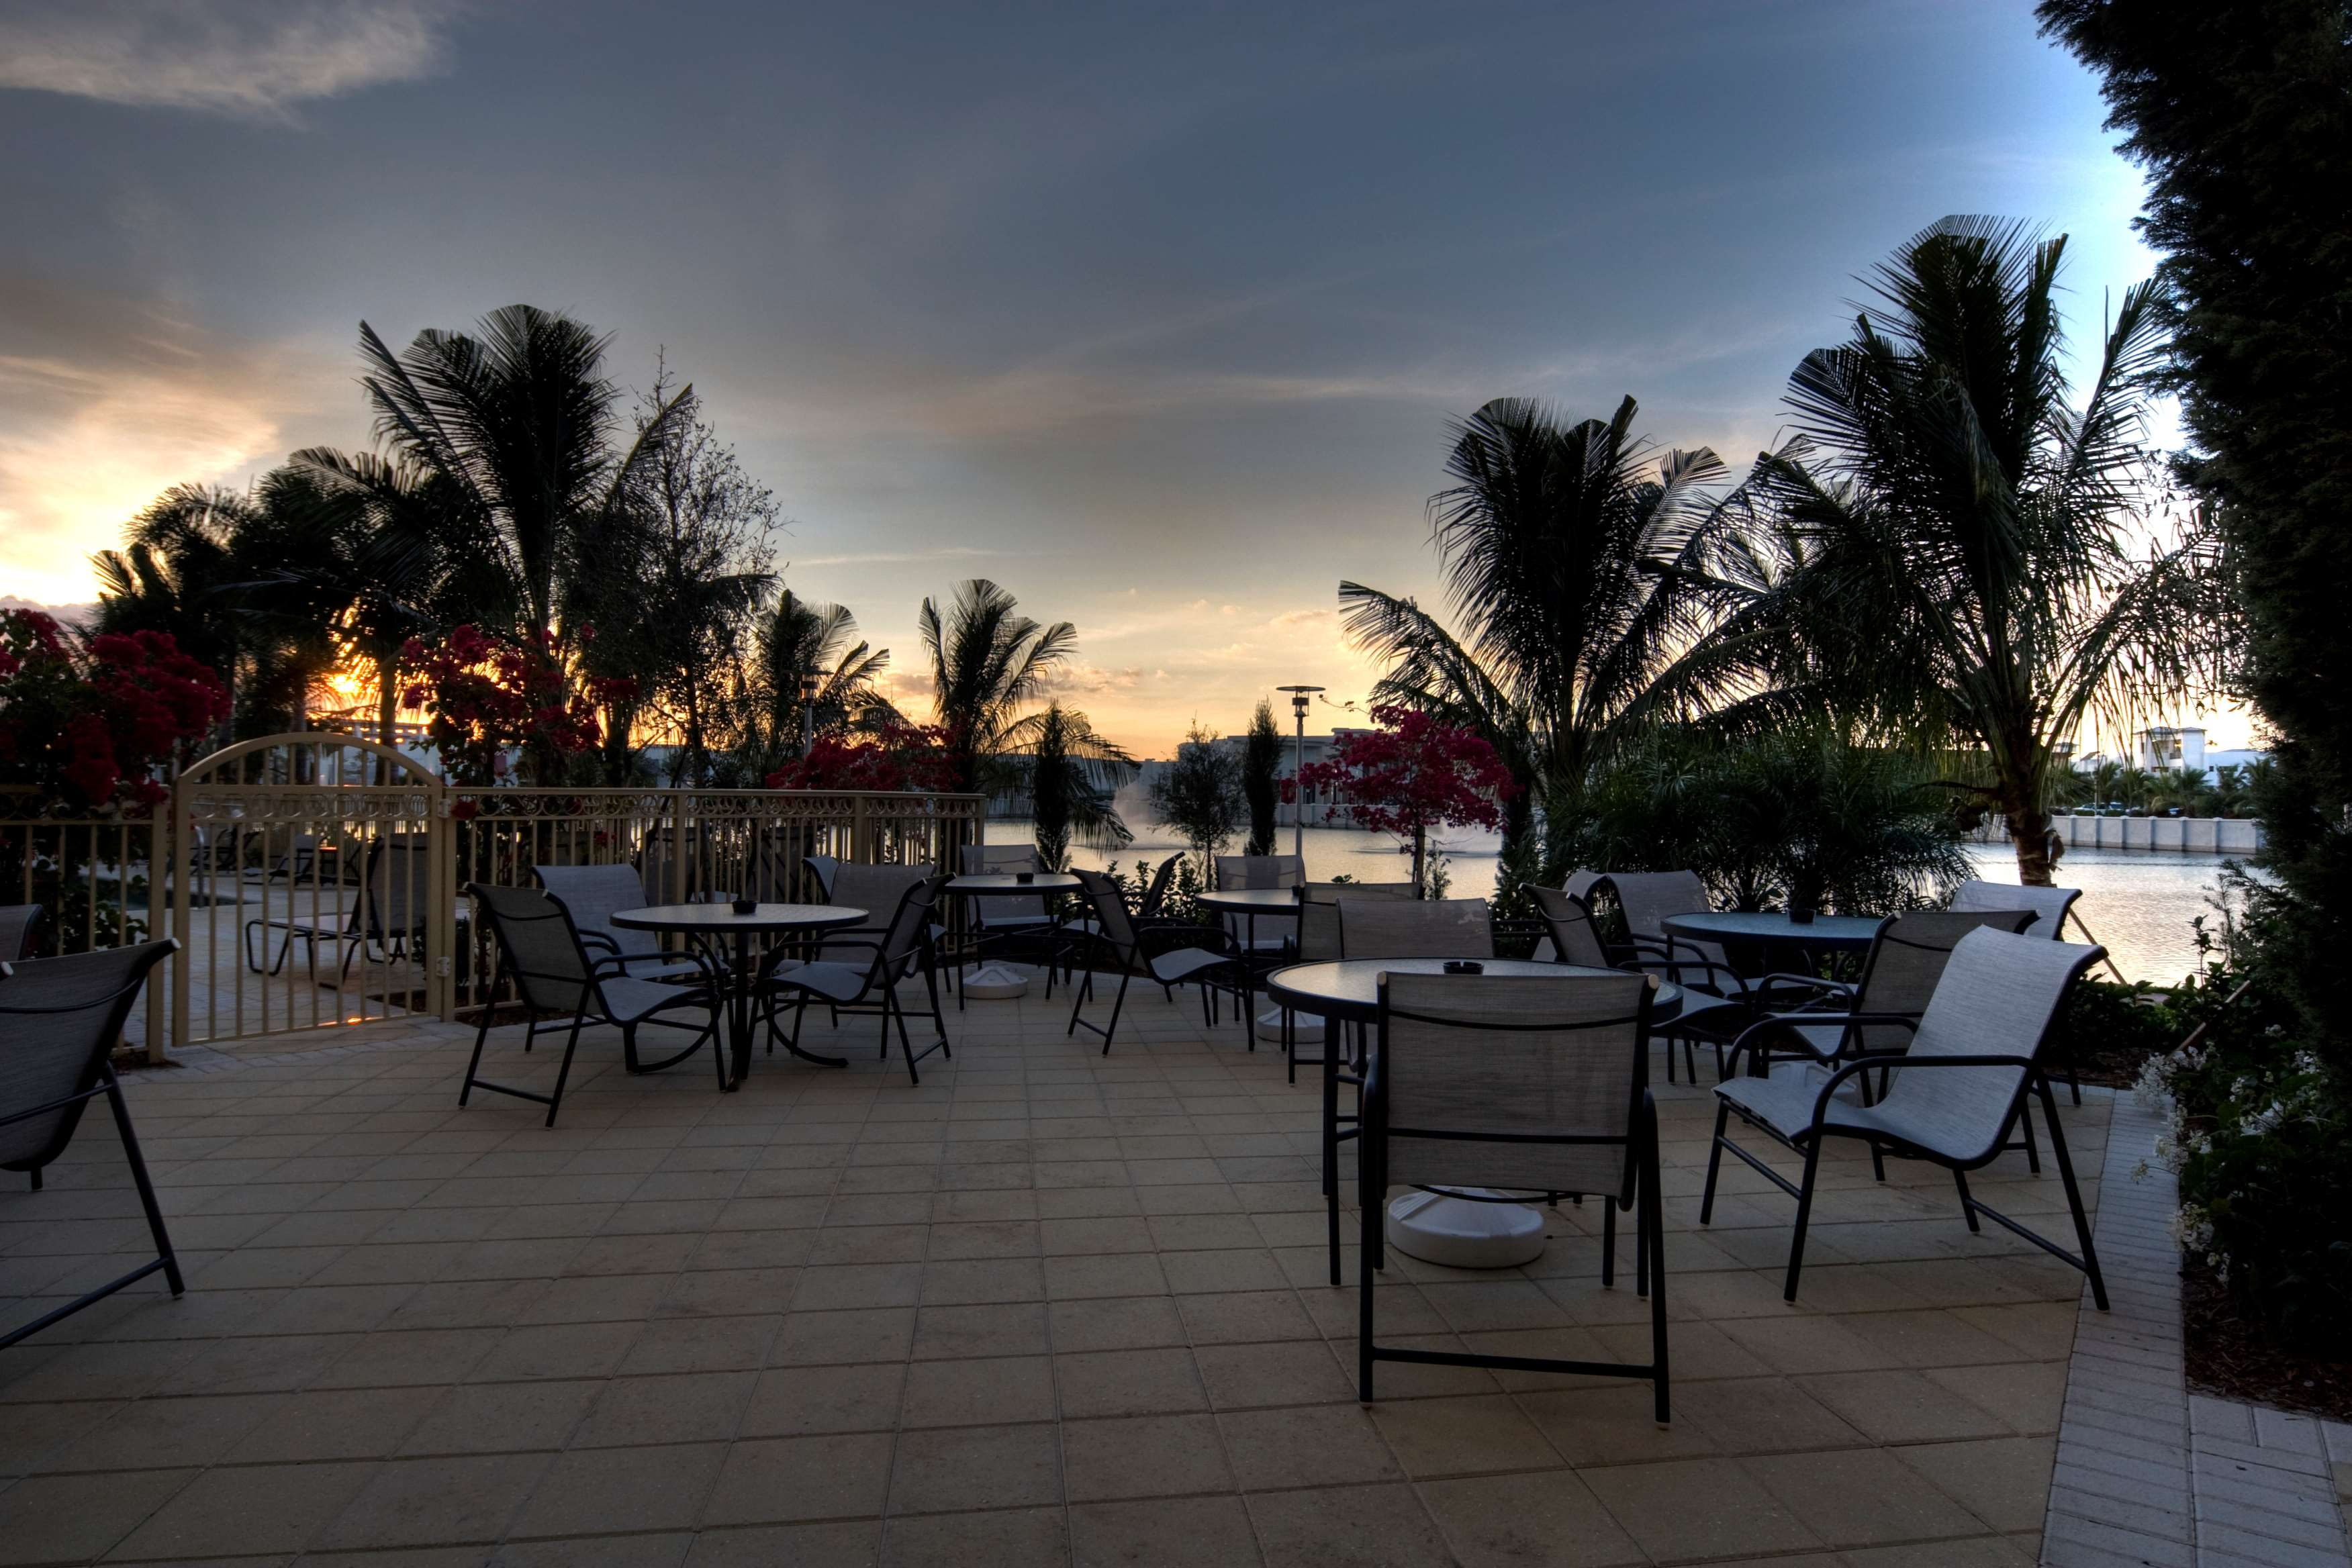 Hilton Garden Inn Palm Beach Gardens image 9